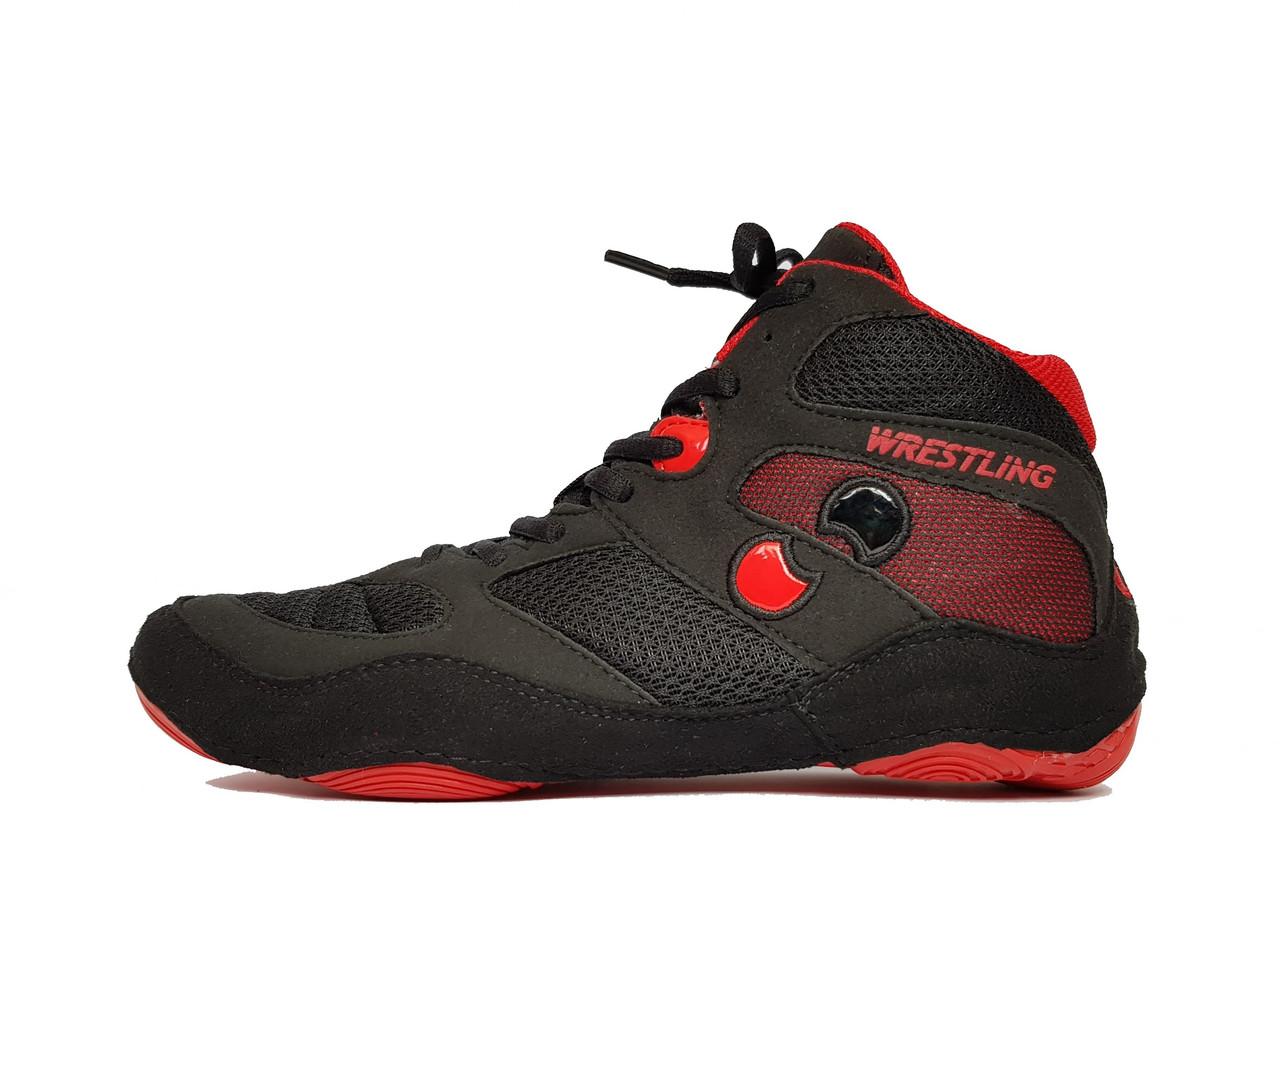 Борцовки детские Shuzoyd Wrestling Shoes, Black/Red